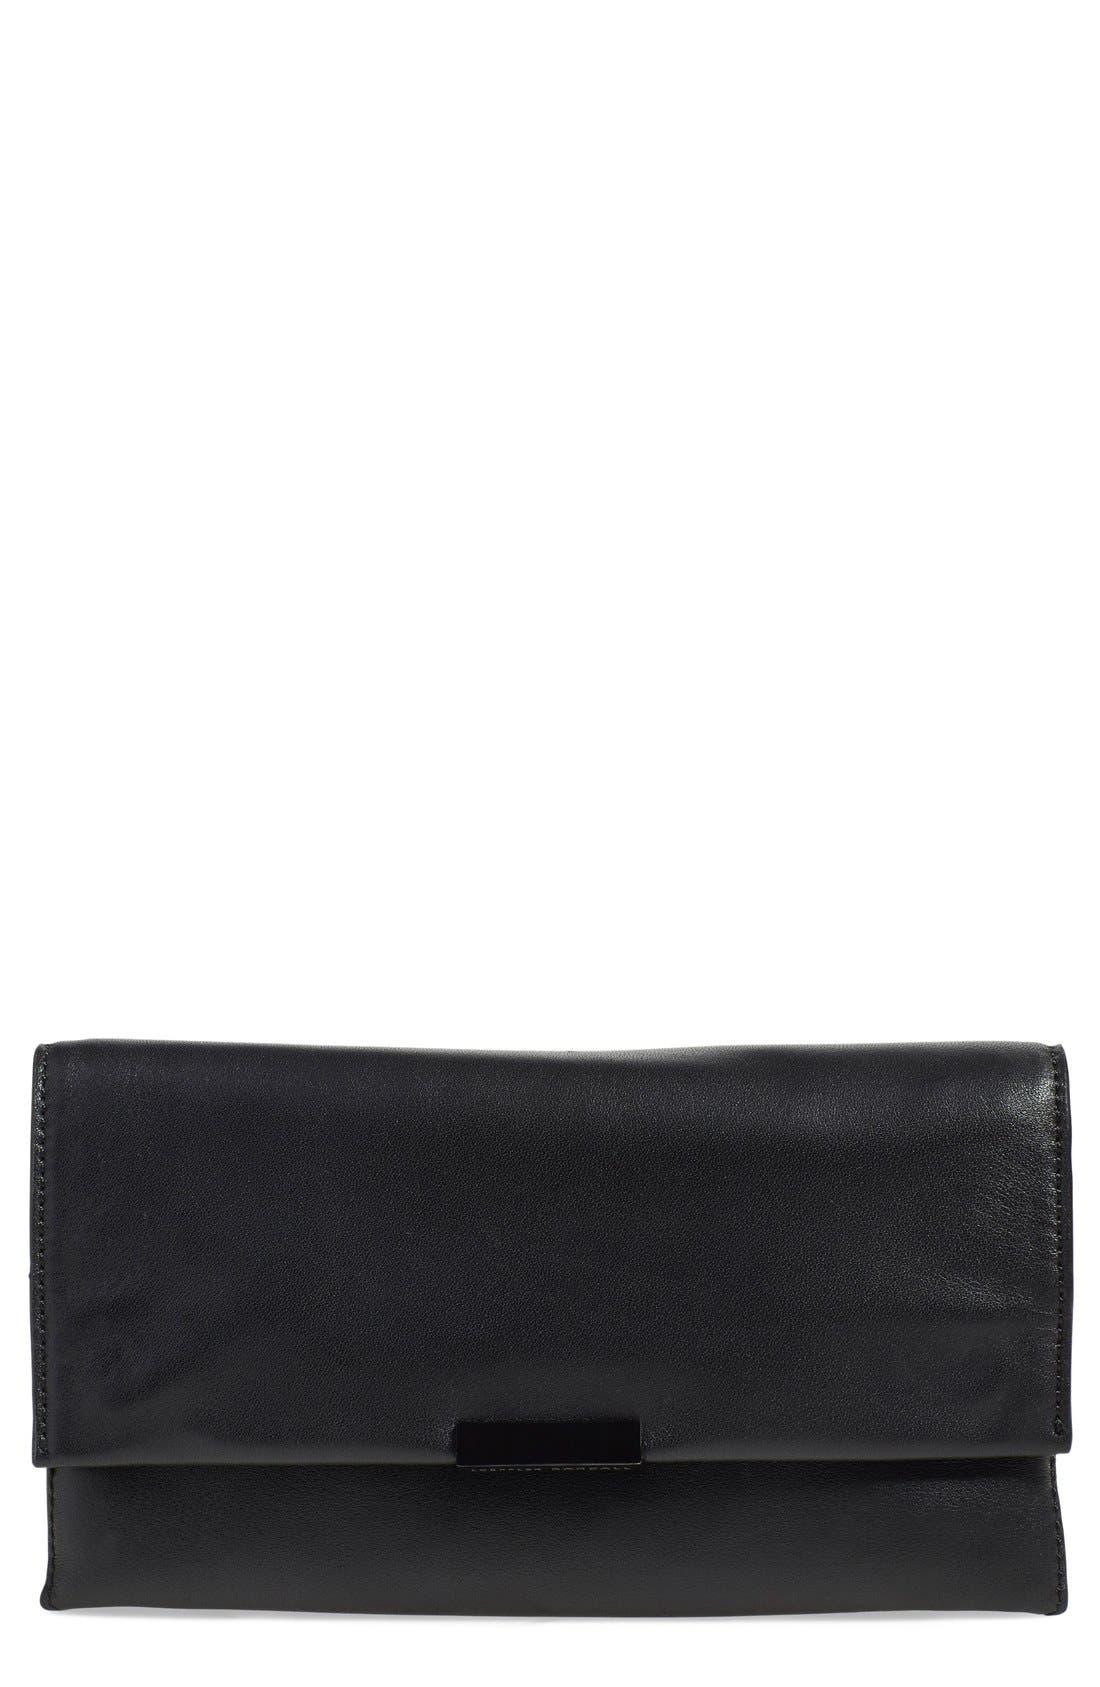 Leather Accordion Clutch,                             Main thumbnail 1, color,                             Black